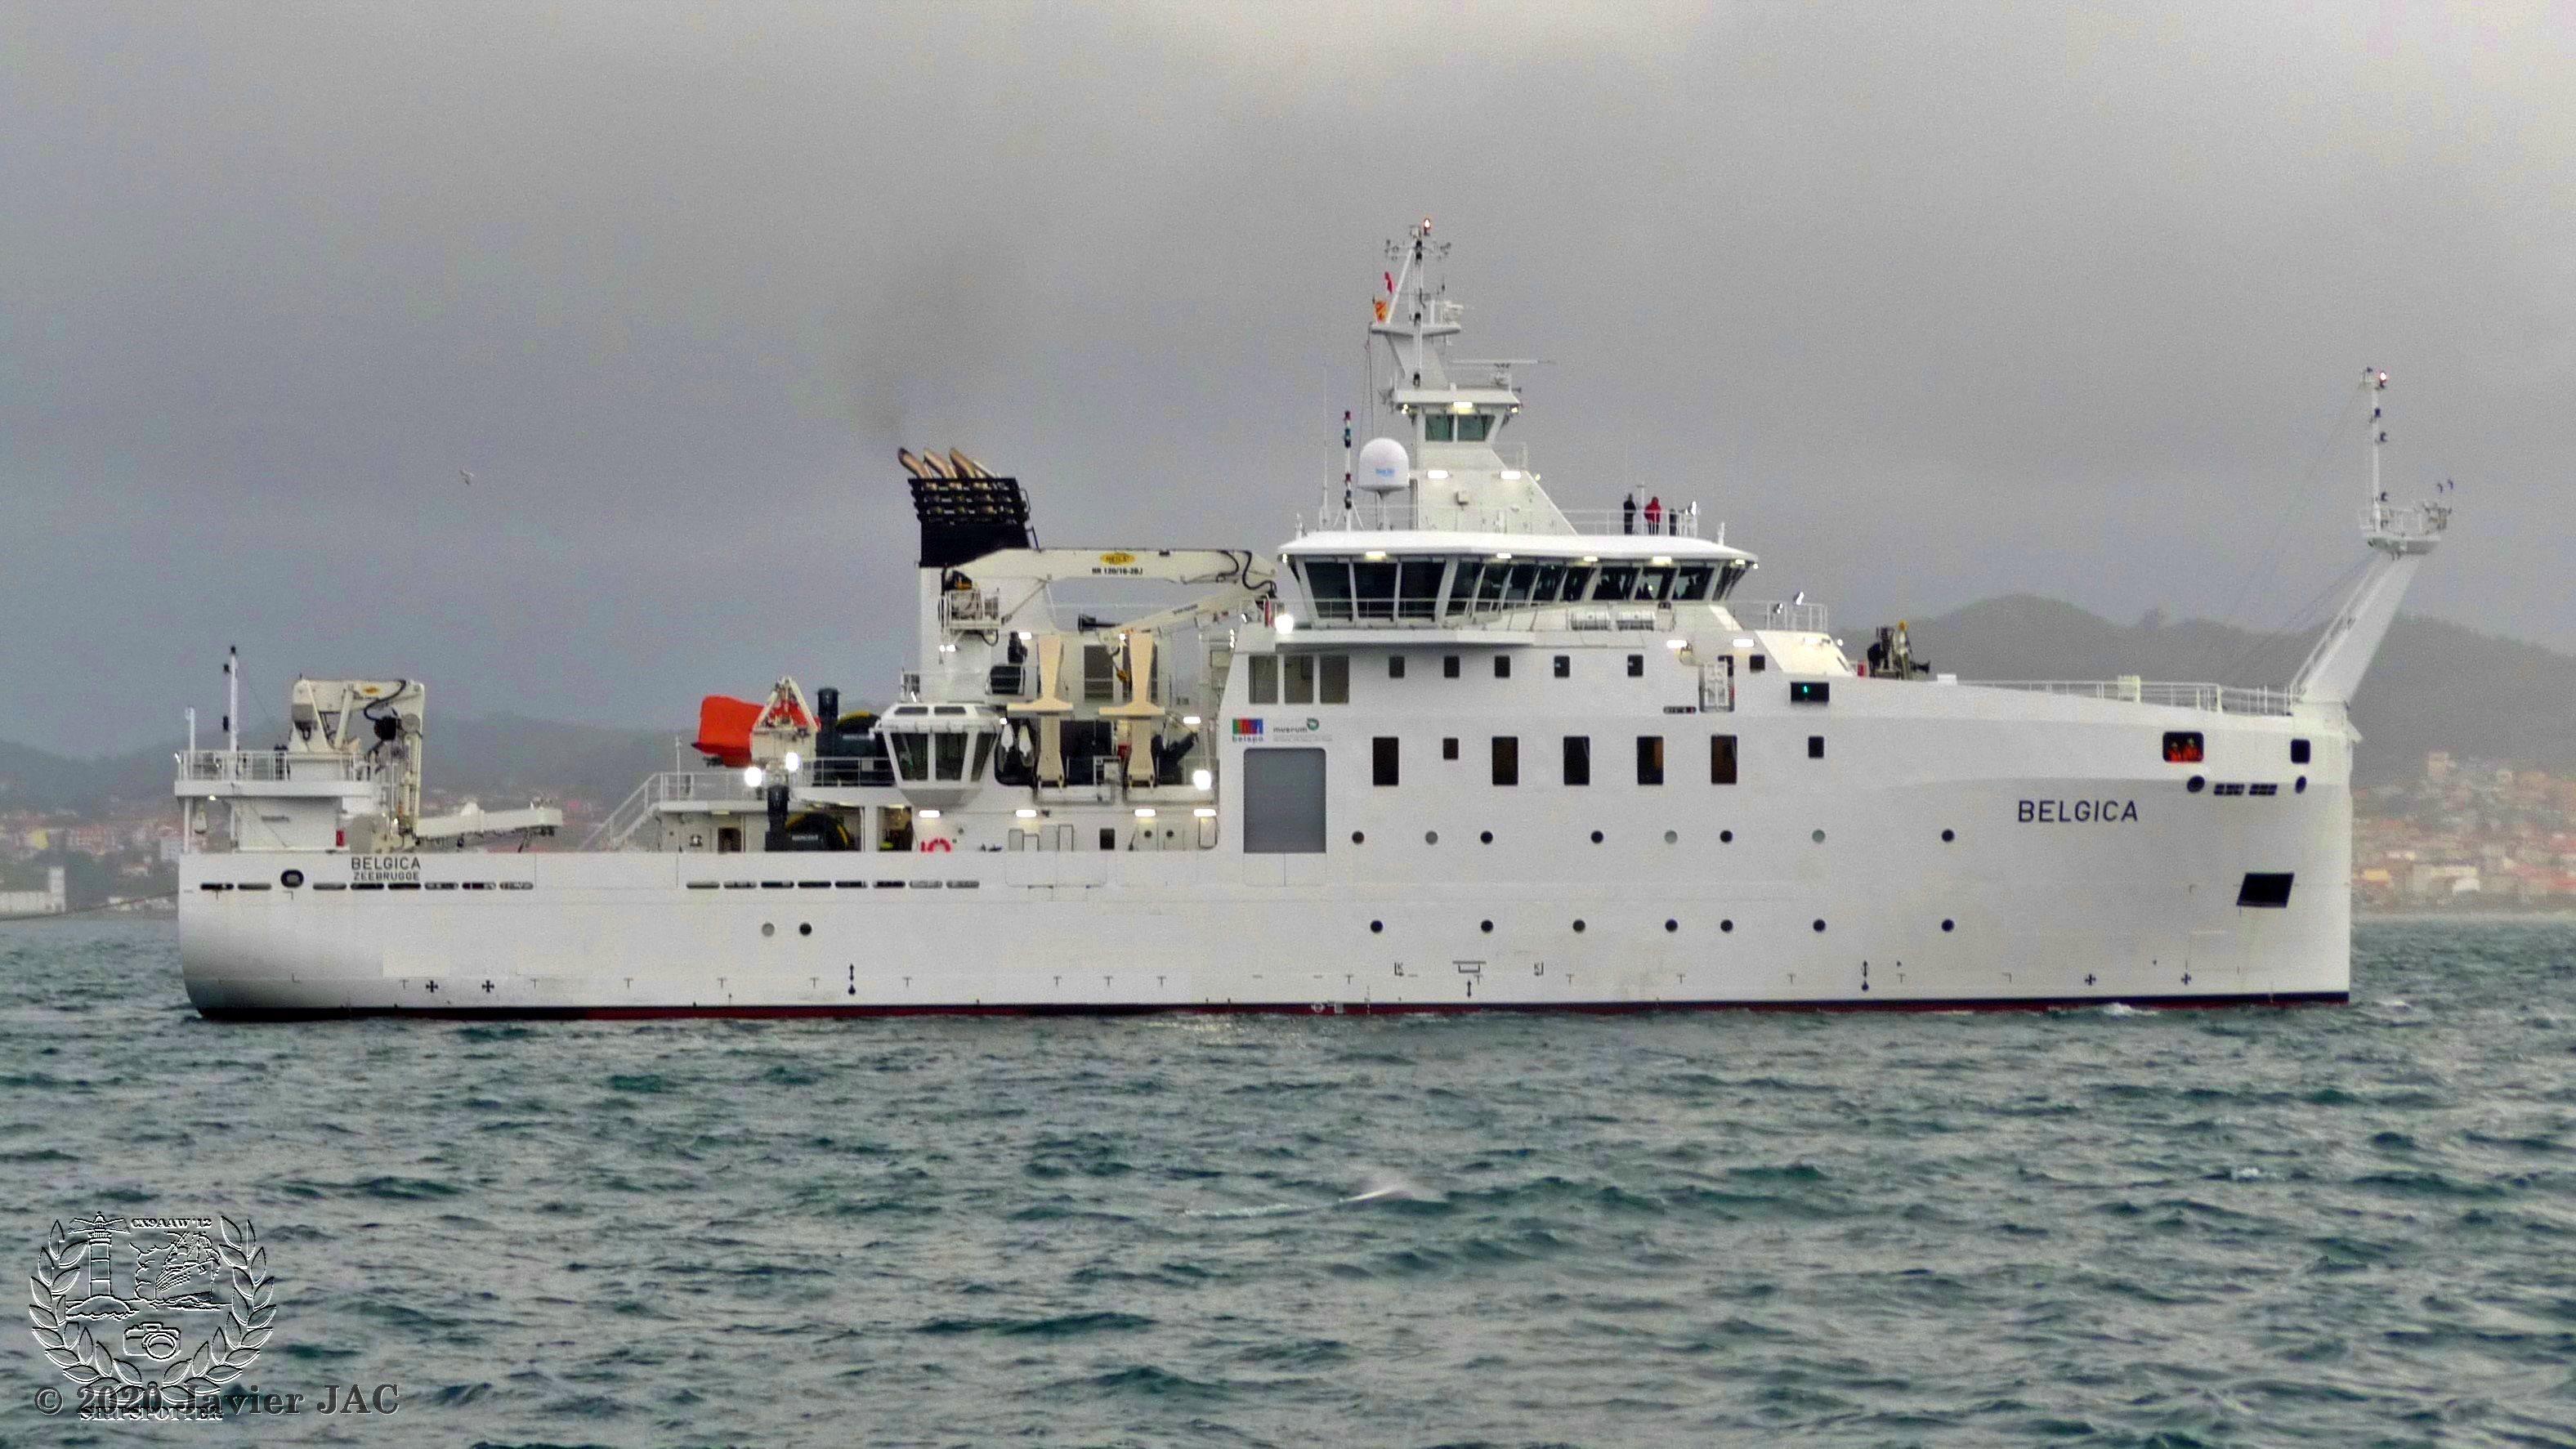 New Federal Research Vessel BELGICA - Page 4 Belgica%2B%2BFreire%2Bshipyard%2BVigo%2B%2BNB-723%2B%25283%2529